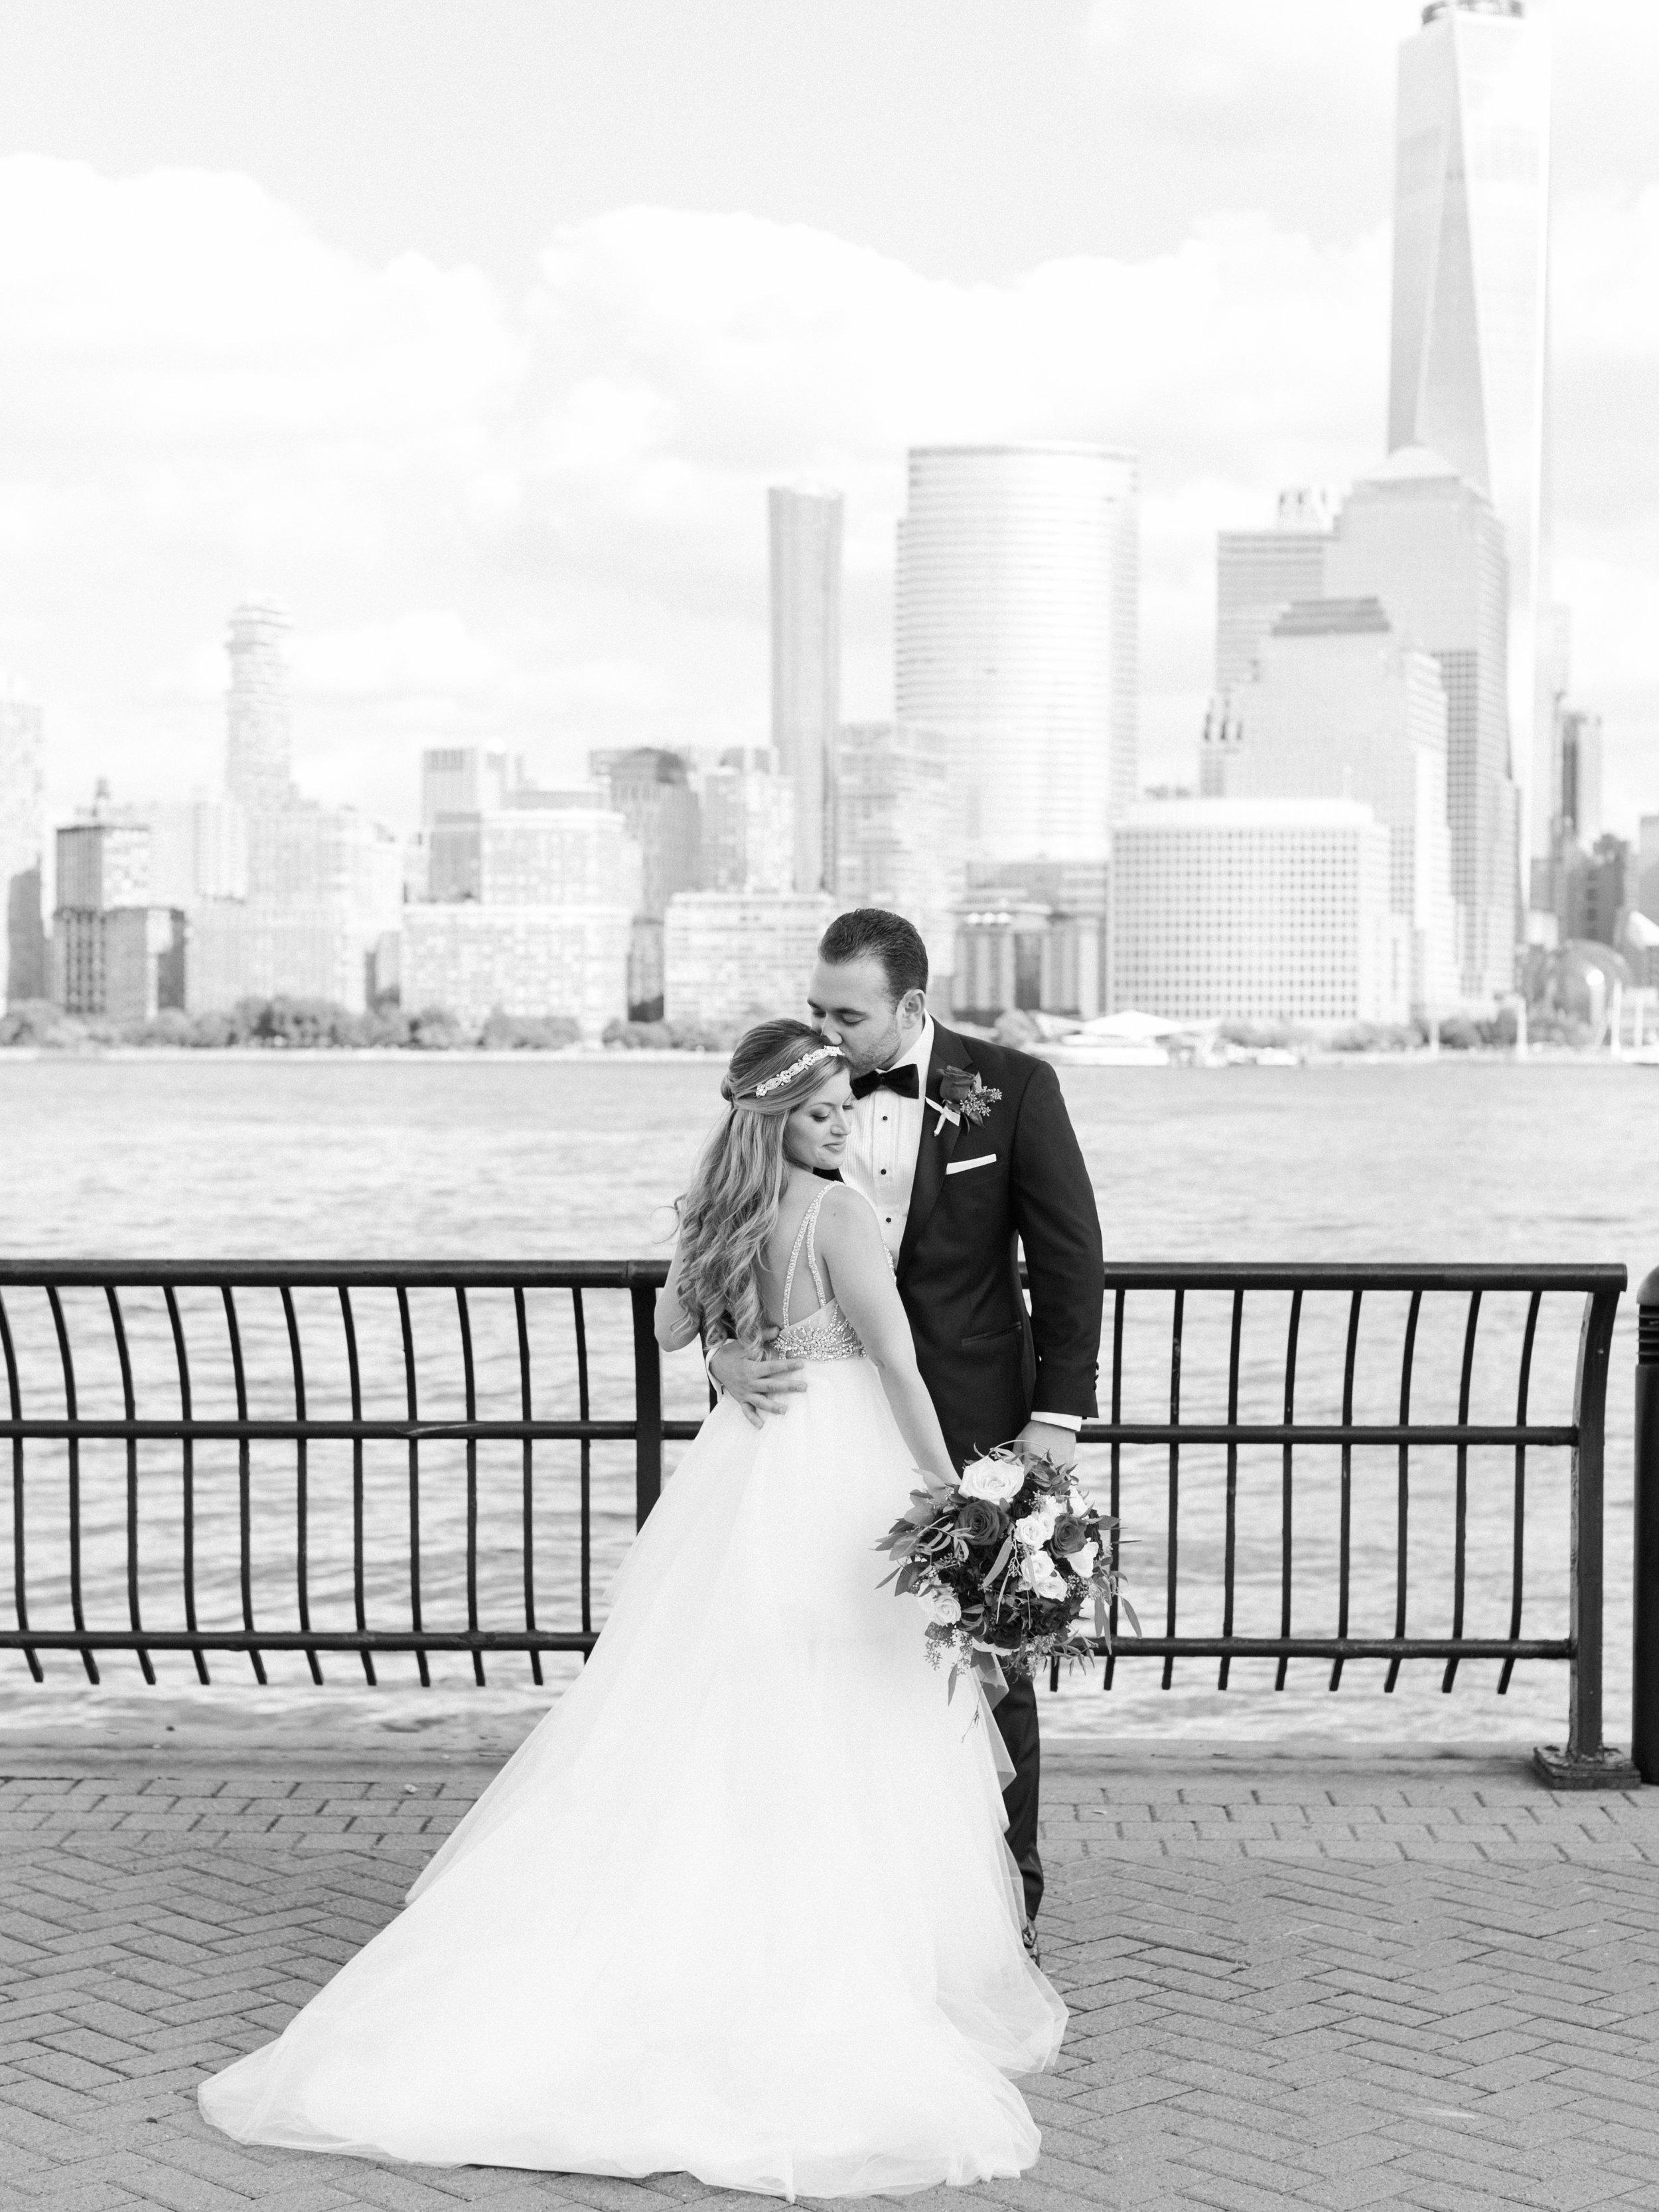 hyatt-regency-jersey-city-wedding-photographer33.jpg